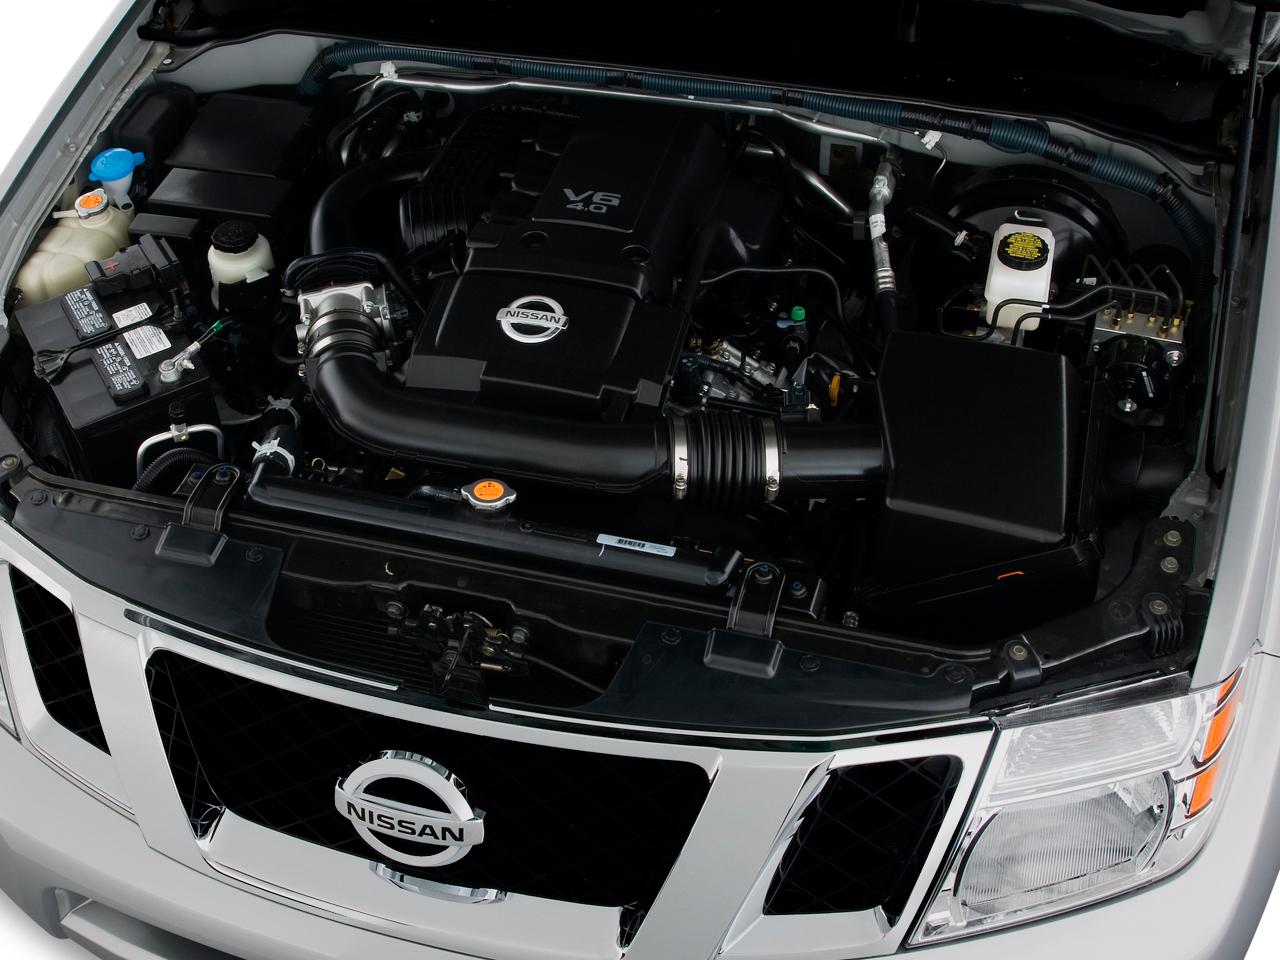 2009 Nissan Pathfinder Le 4x4 Nissan Midsize Suv Review